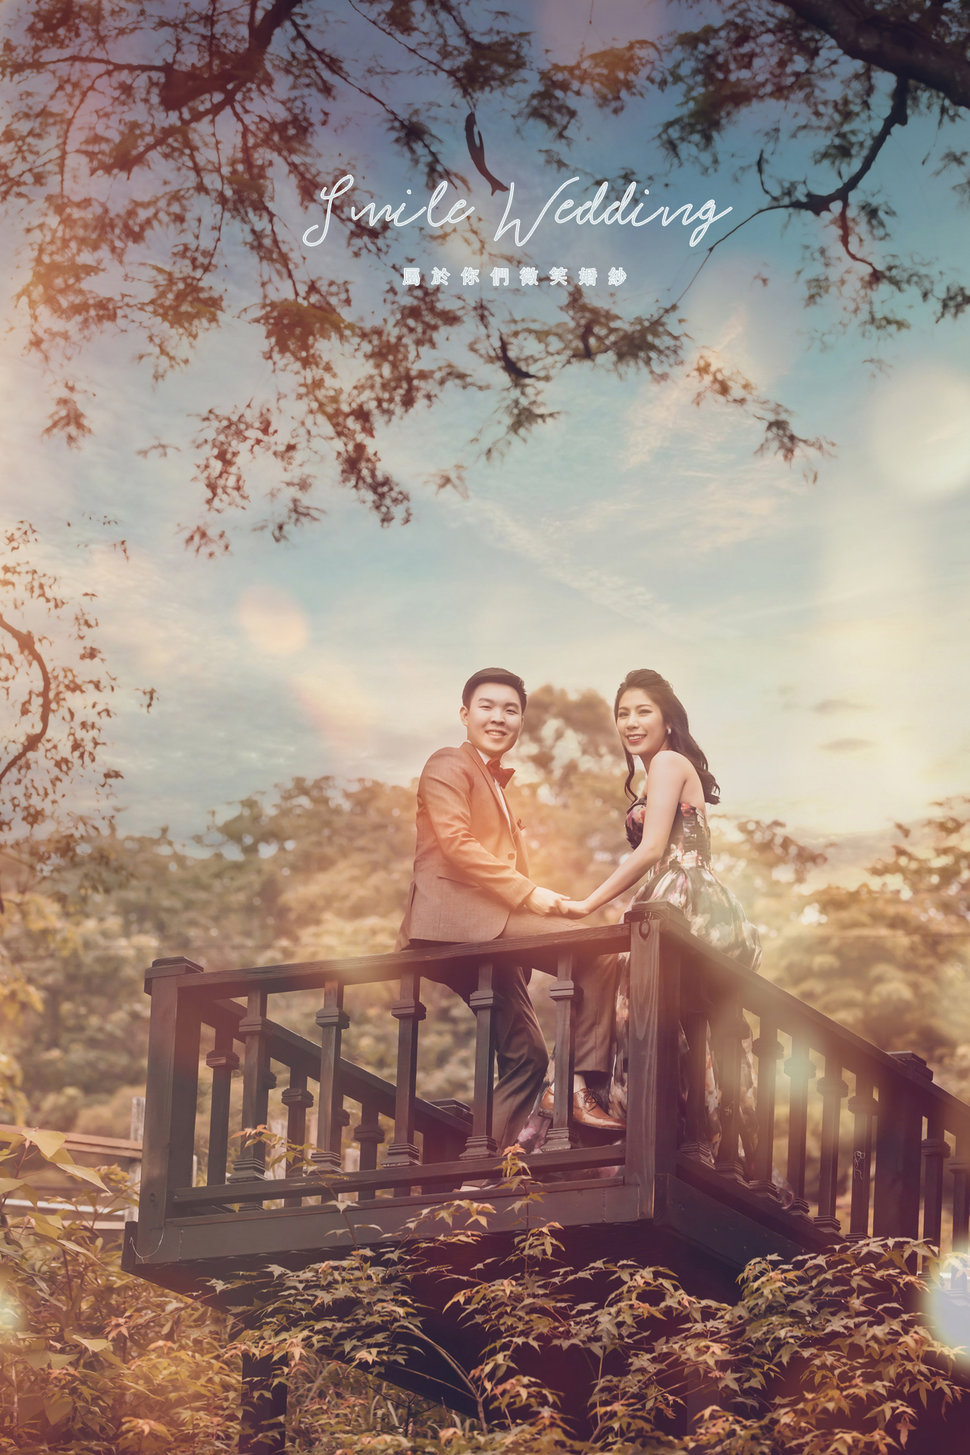 SIN_8801 - Smile wedding 微笑婚紗《結婚吧》